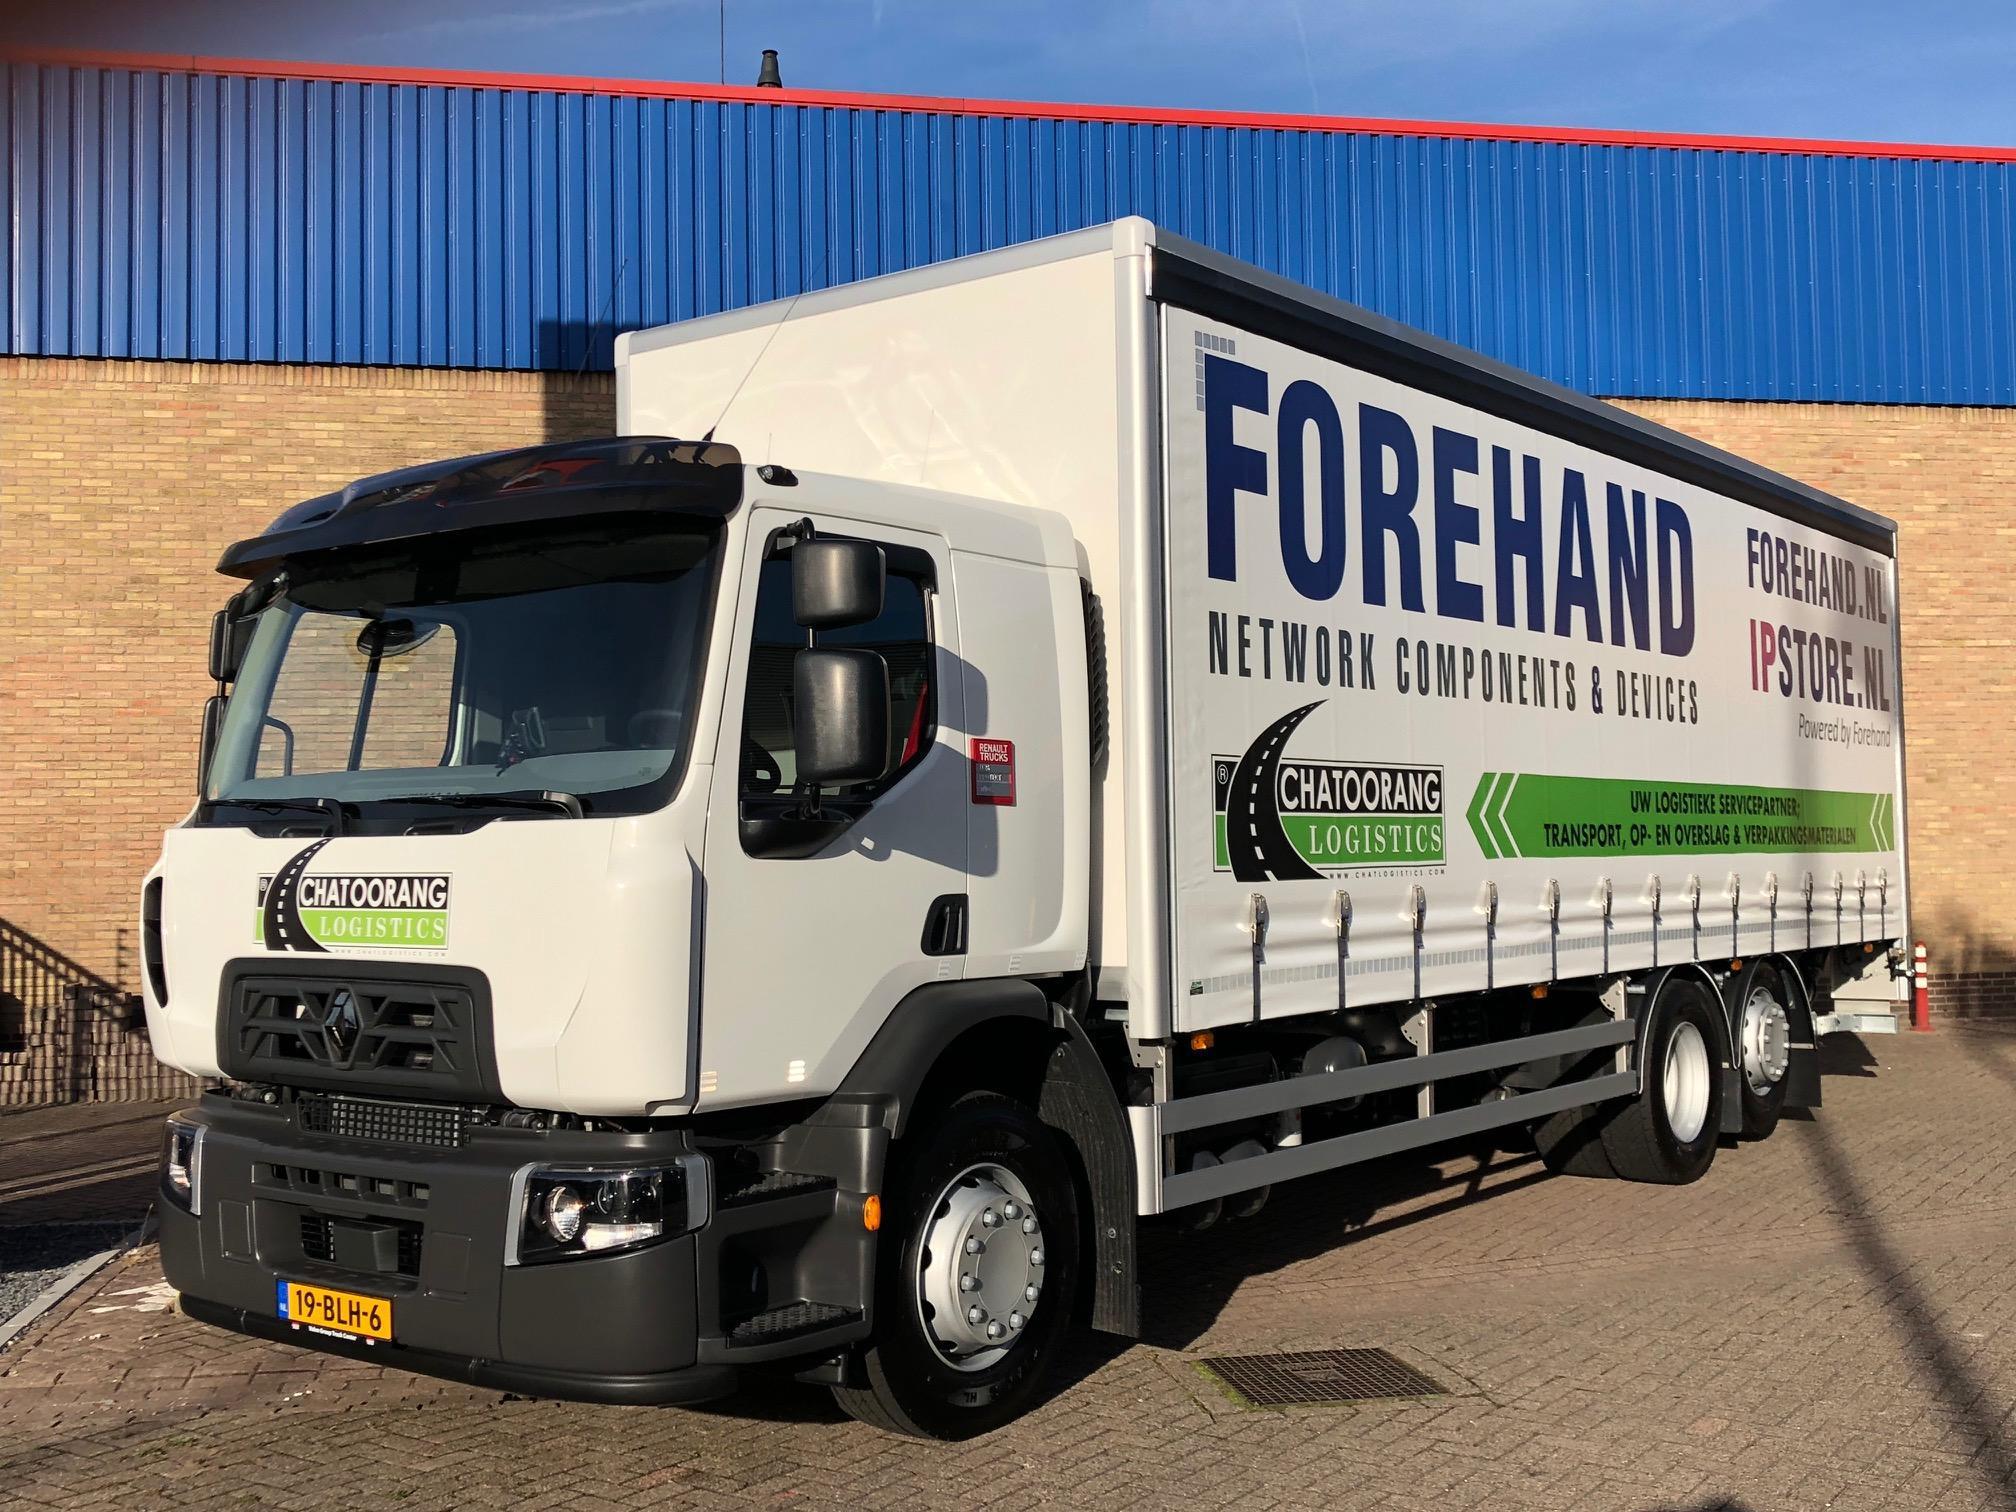 Vrachtwagen zoekt chauffeur (Dordrecht)